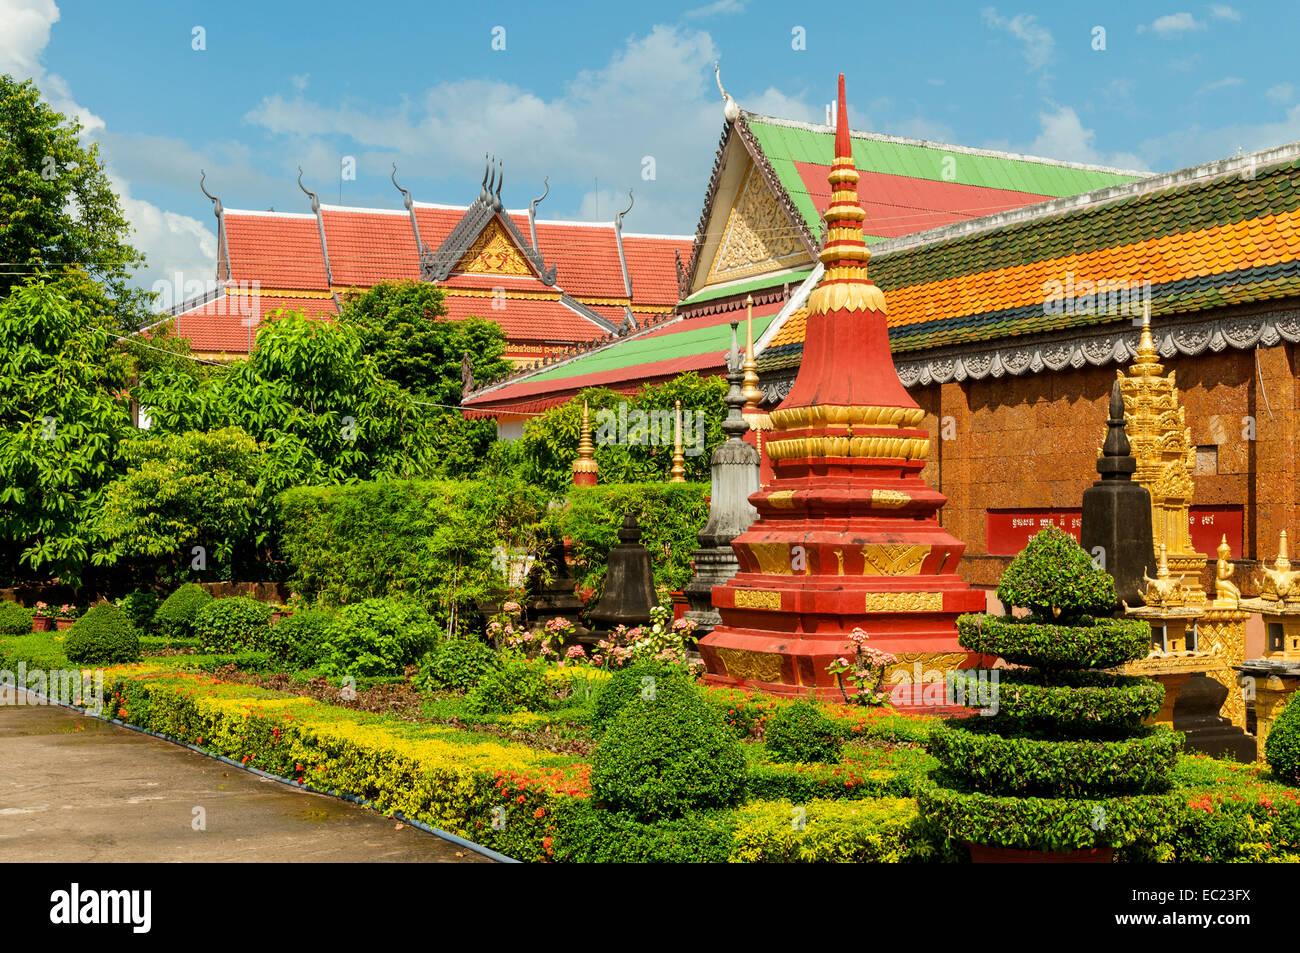 Cemetery Garden at Praea Monastery, Siem Reap, Cambodia Stock Photo